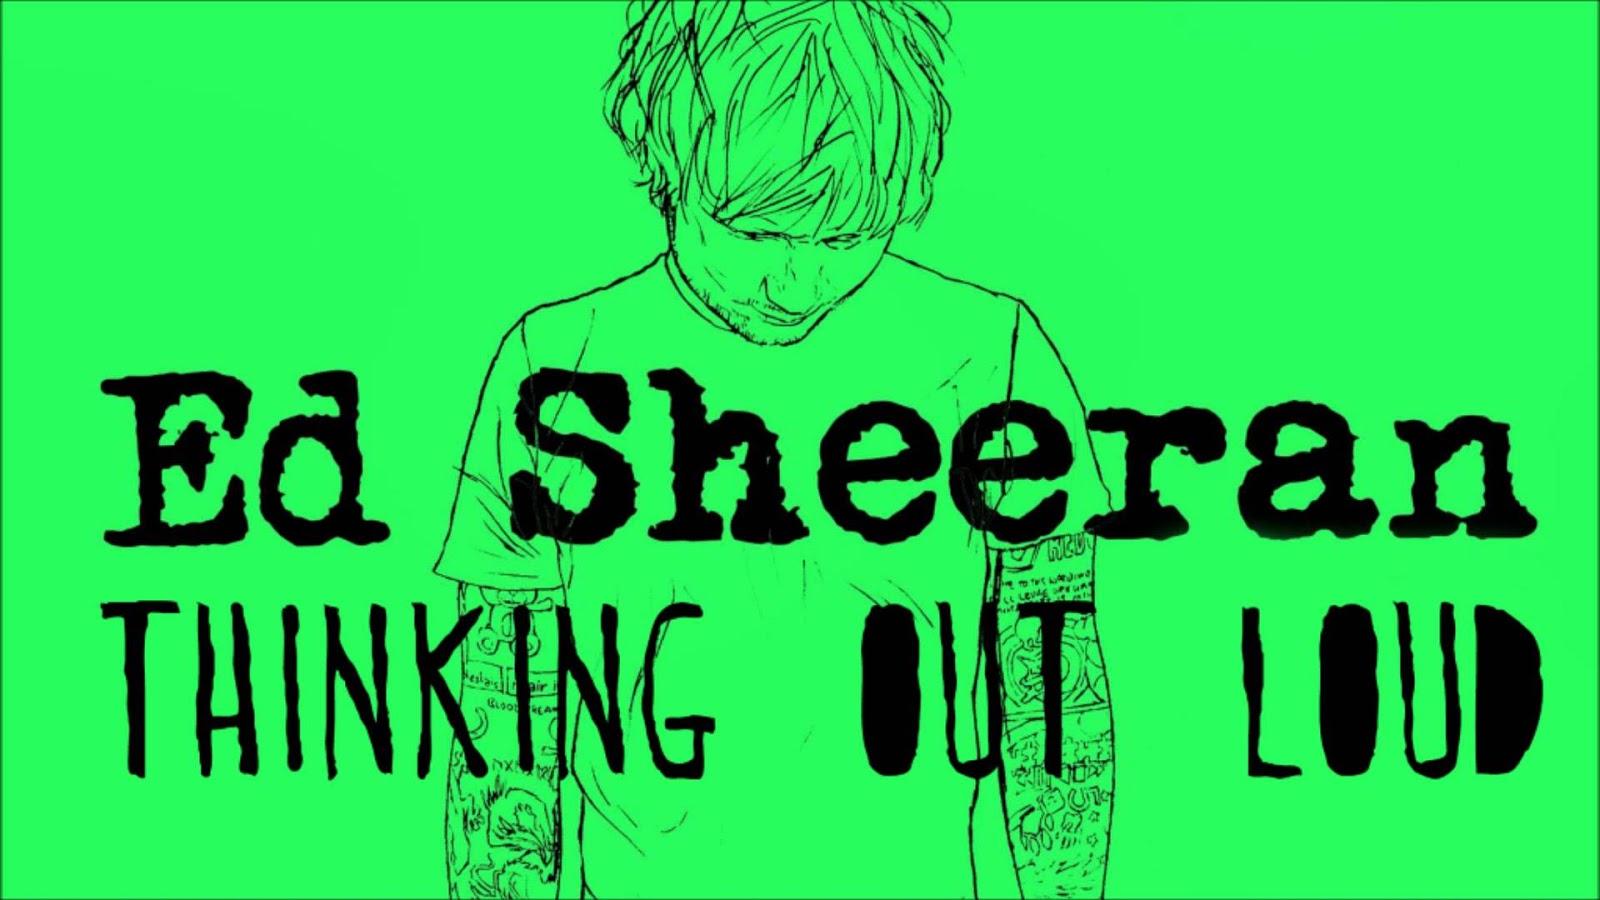 Ed Sheeran Thinking Out Loud Mp3 Descargar Gratis idea gallery